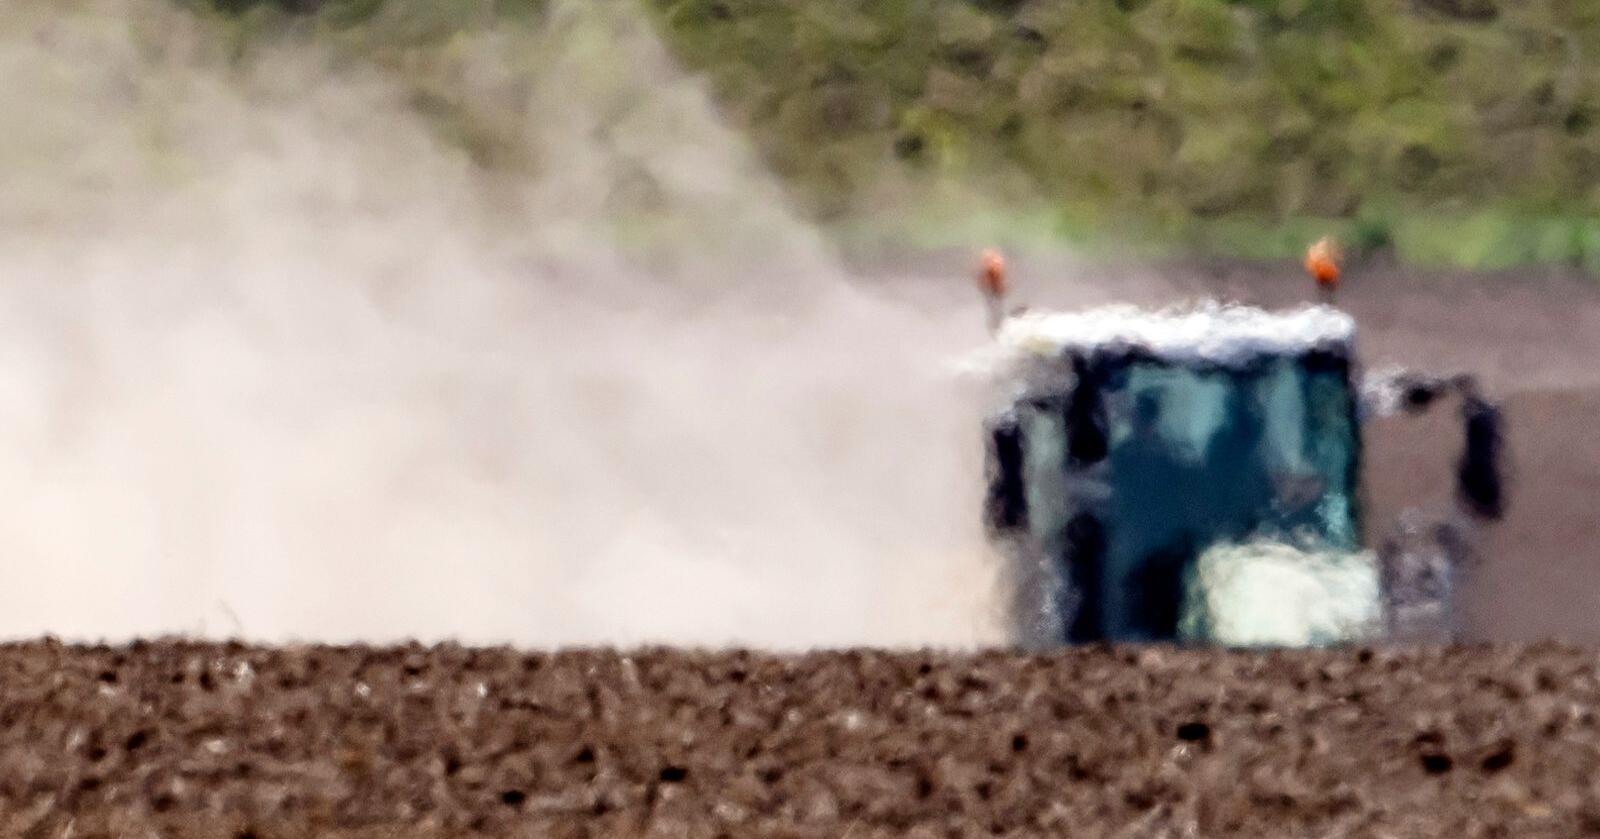 En bonde i Bad Lauchstaedt i Tyskland pløyer åkeren sin i hetedisen. En studie fra nederlandske forskere spår at en tredel av verdens befolkning kan lide under ekstrem hete om 50 år. Foto: AP / NTB scanpix